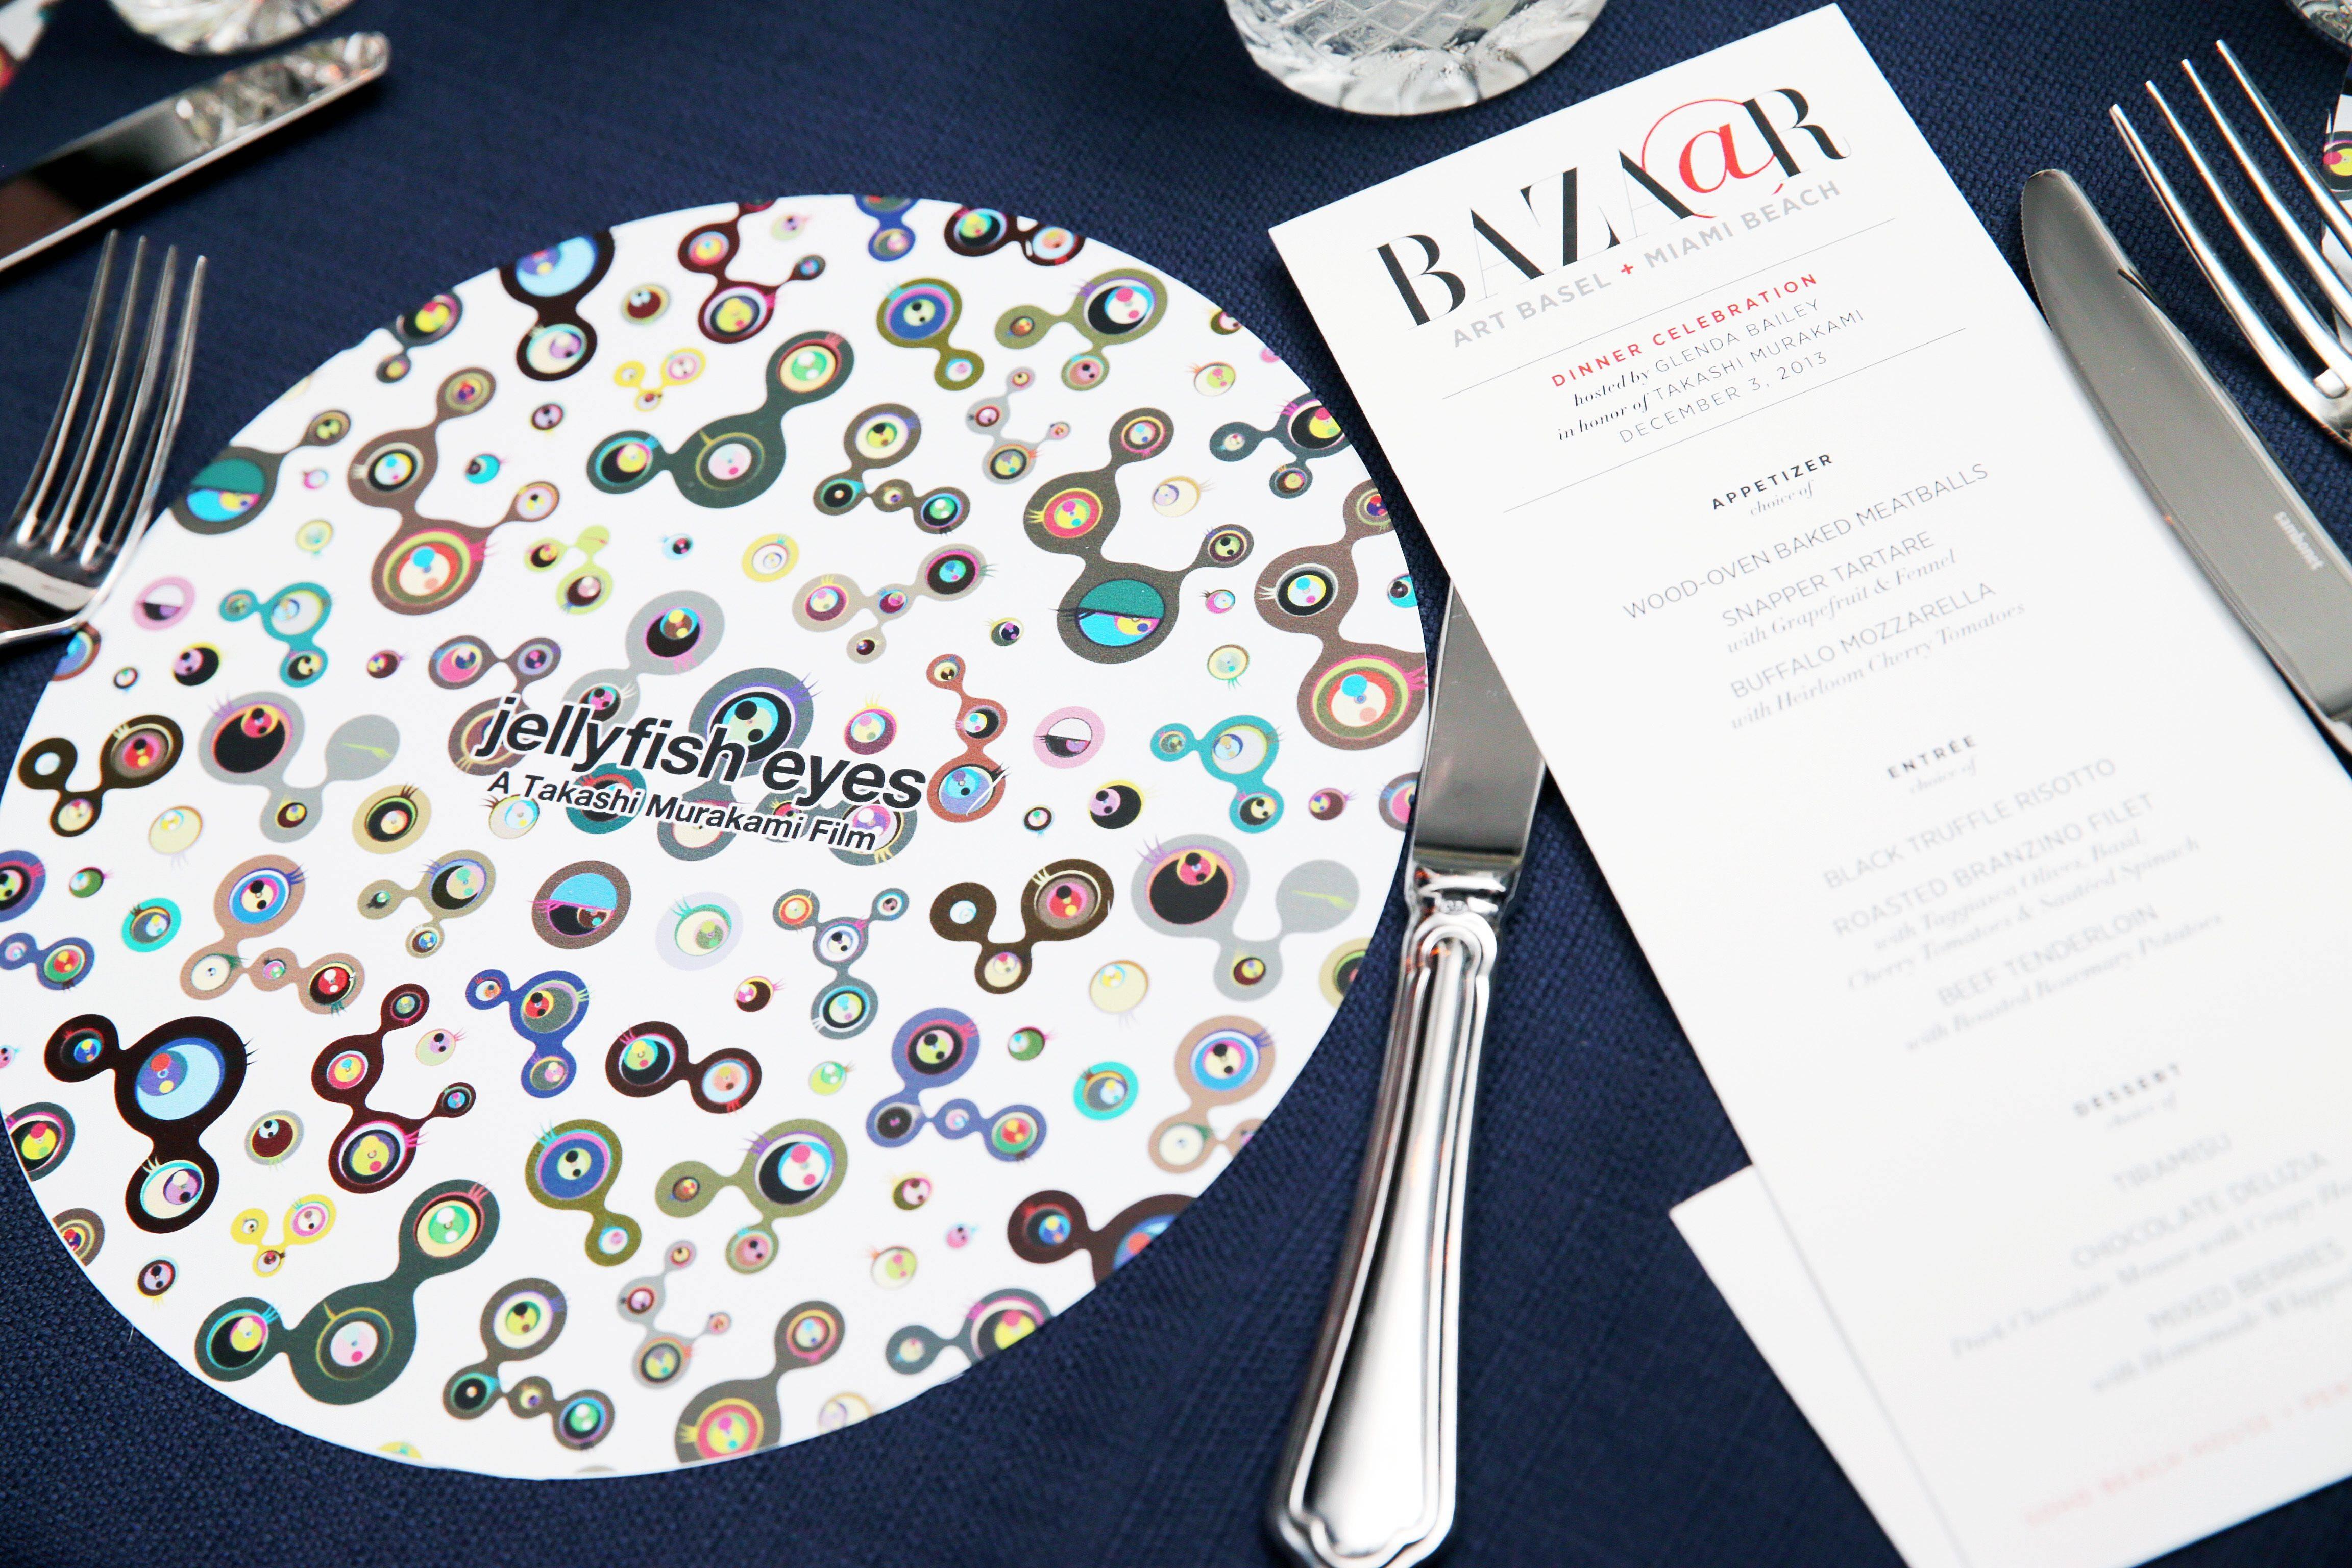 Intimate Dinner Hosted by Glenda Bailey, Editor in Chief of HARPER'S BAZAAR, Celebrating Takashi Murakami's New Film, Jellyfish Eyes at Soho Beach House